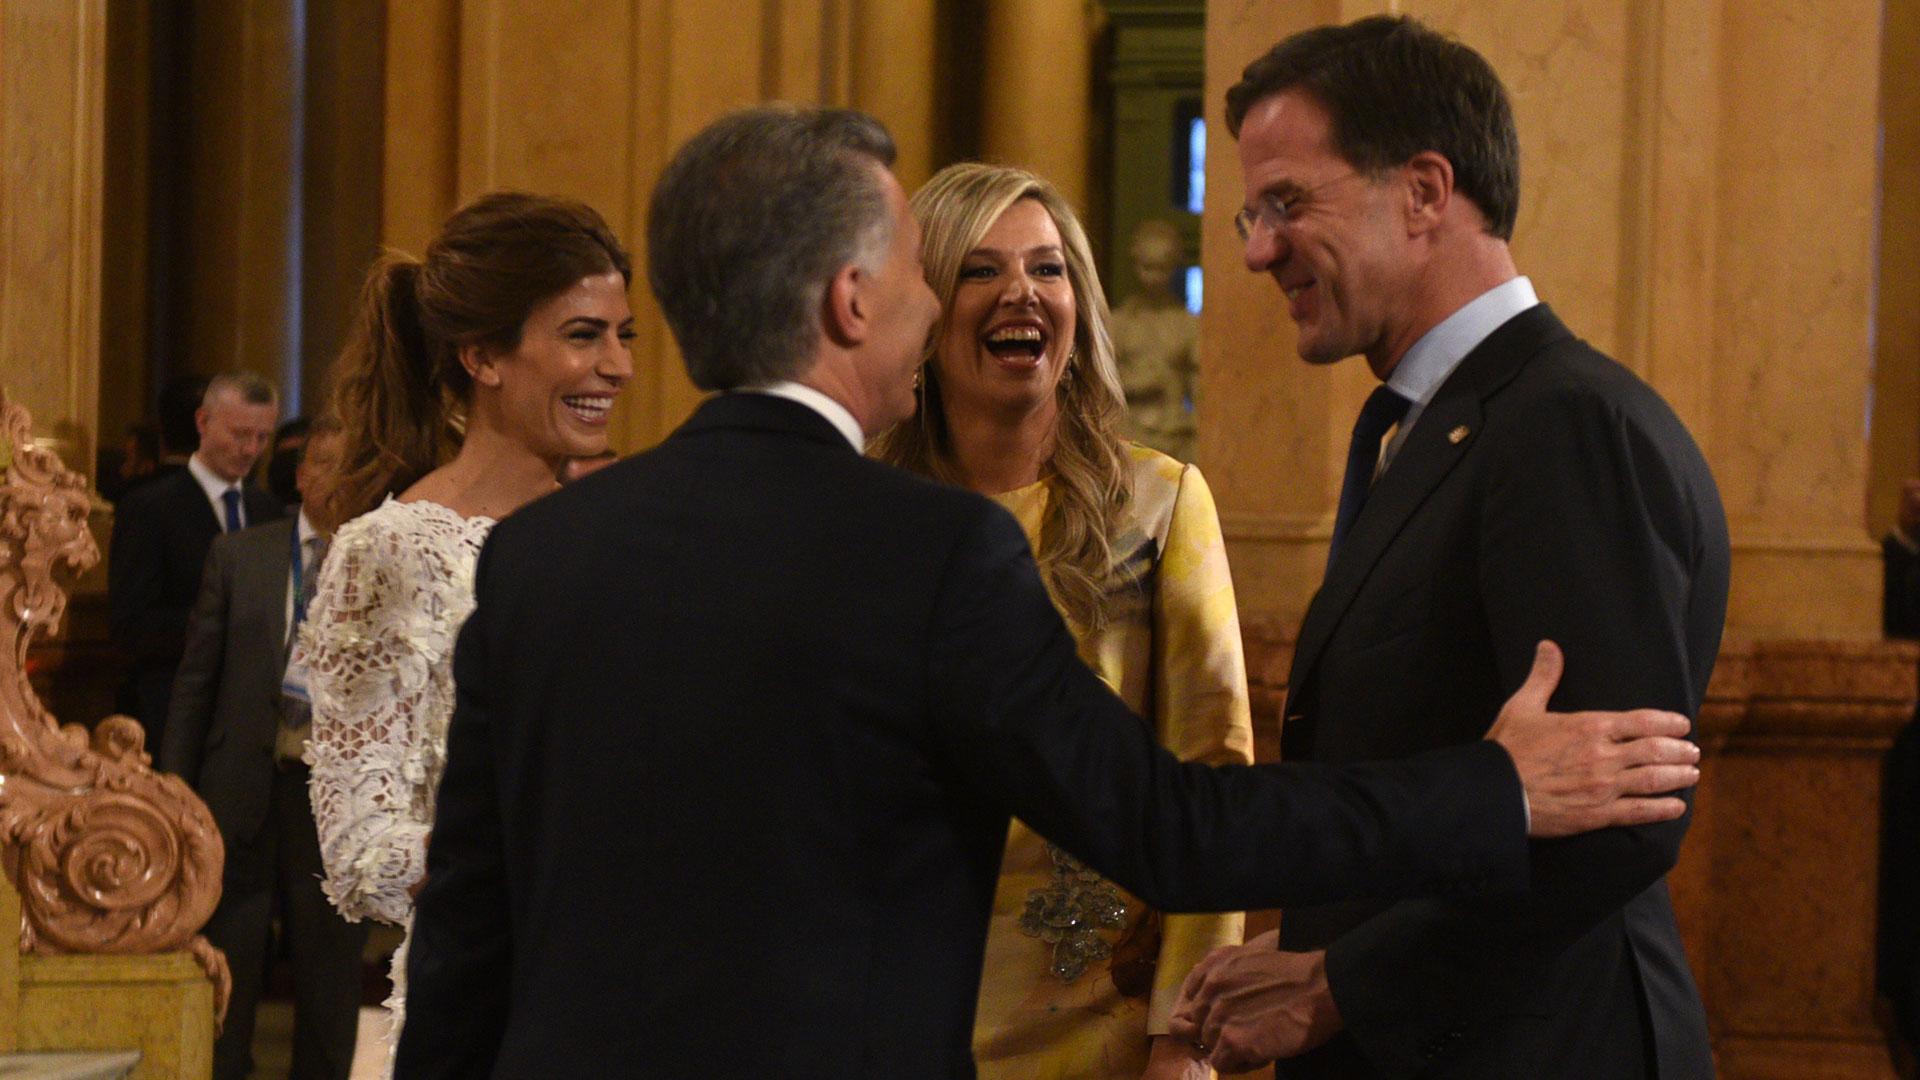 La reina Máxima de Holanda junto a Mauricio Macri, Juliana Awada yMark Rutte, Primer MinistrodeHolanda